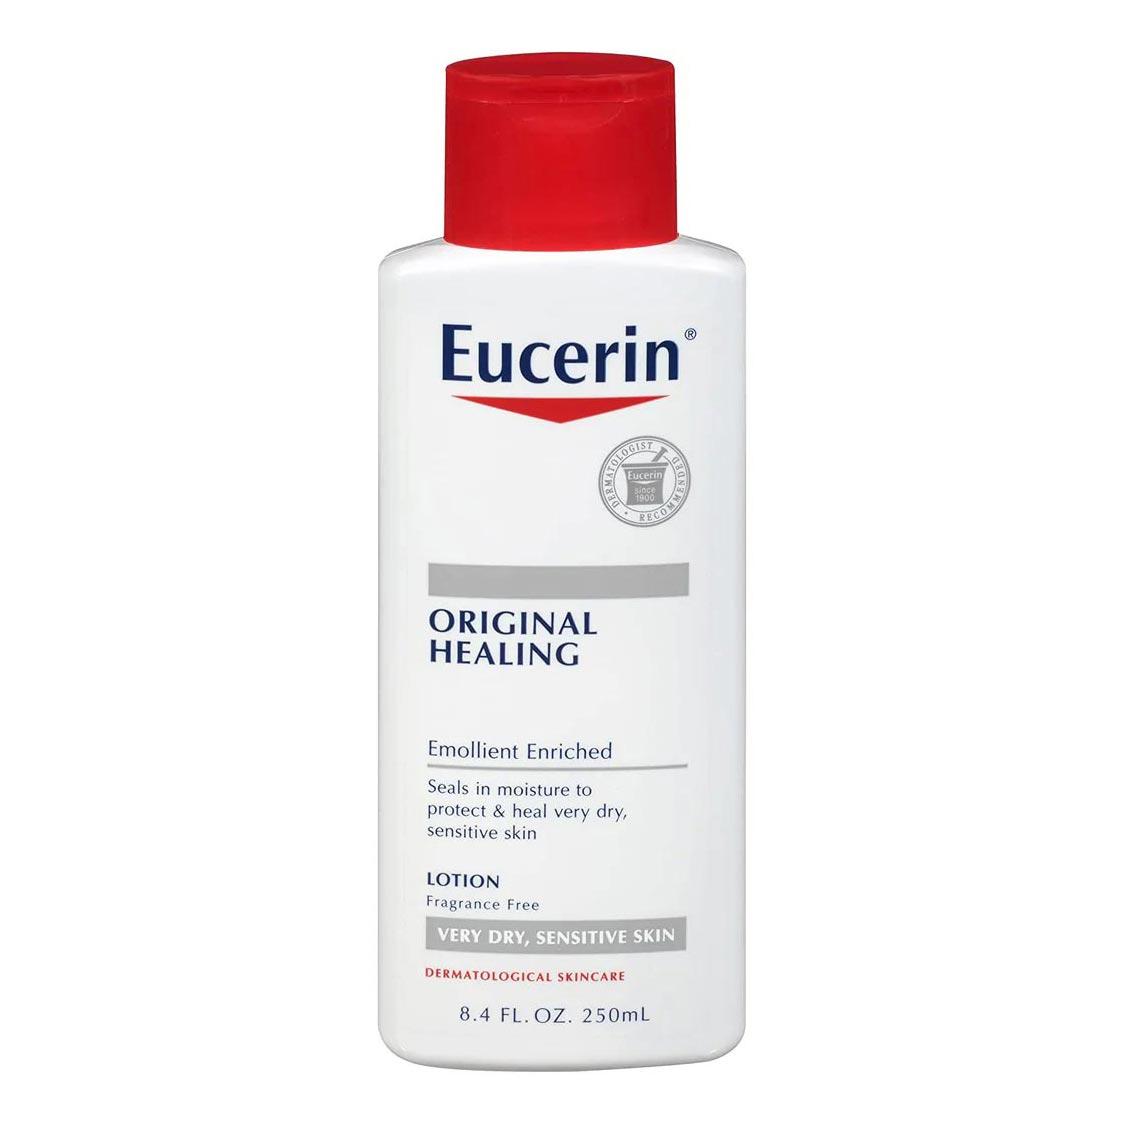 Beiersdorf Eucerin Original Healing Moisturizing Lotion, 8.4 oz